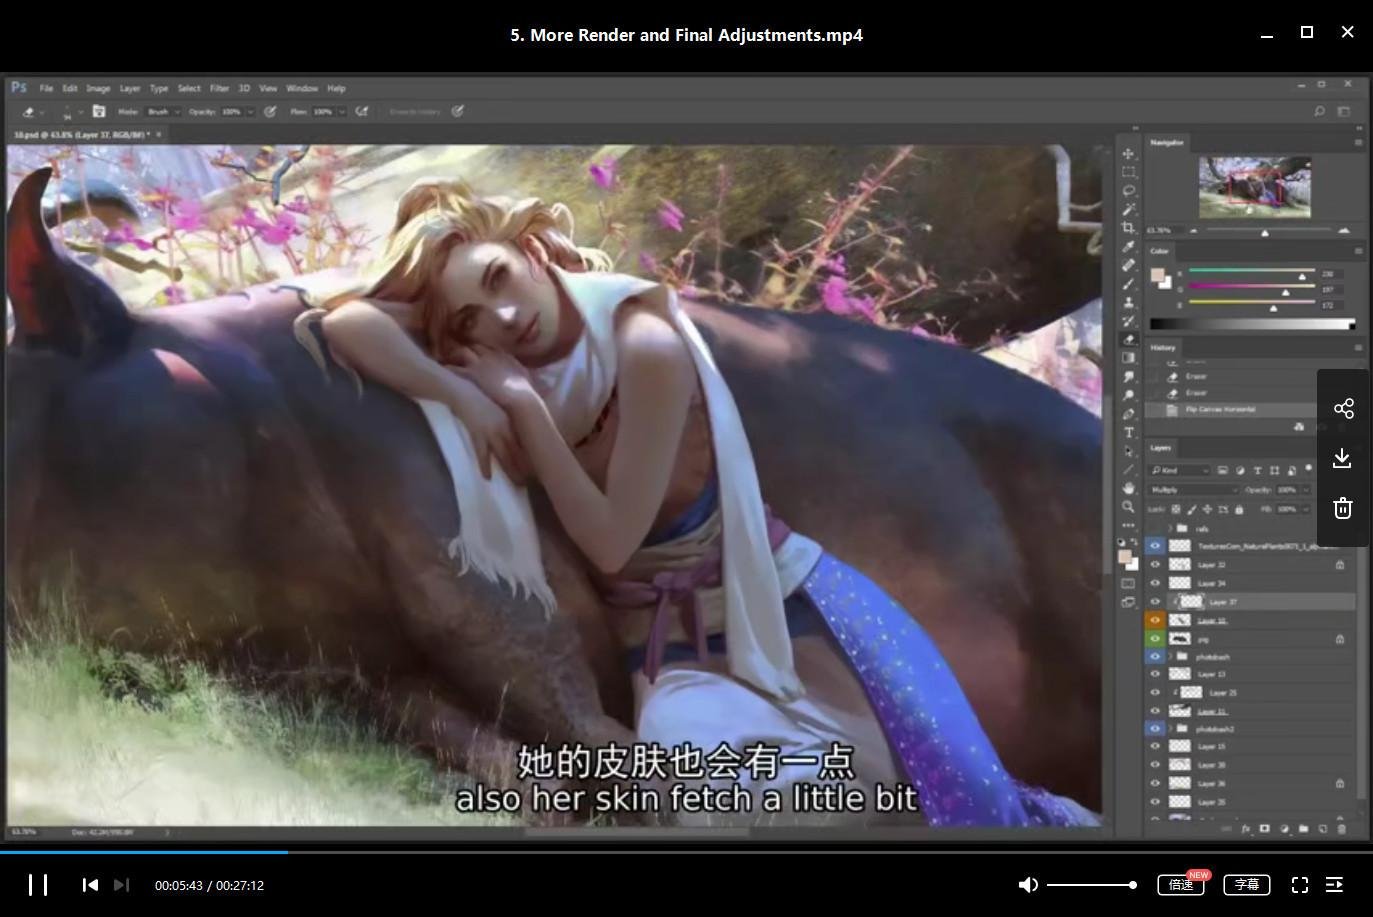 3D教程-Artstation 2018大师班视频教程十部合集 中文字幕 35.88GB(6)